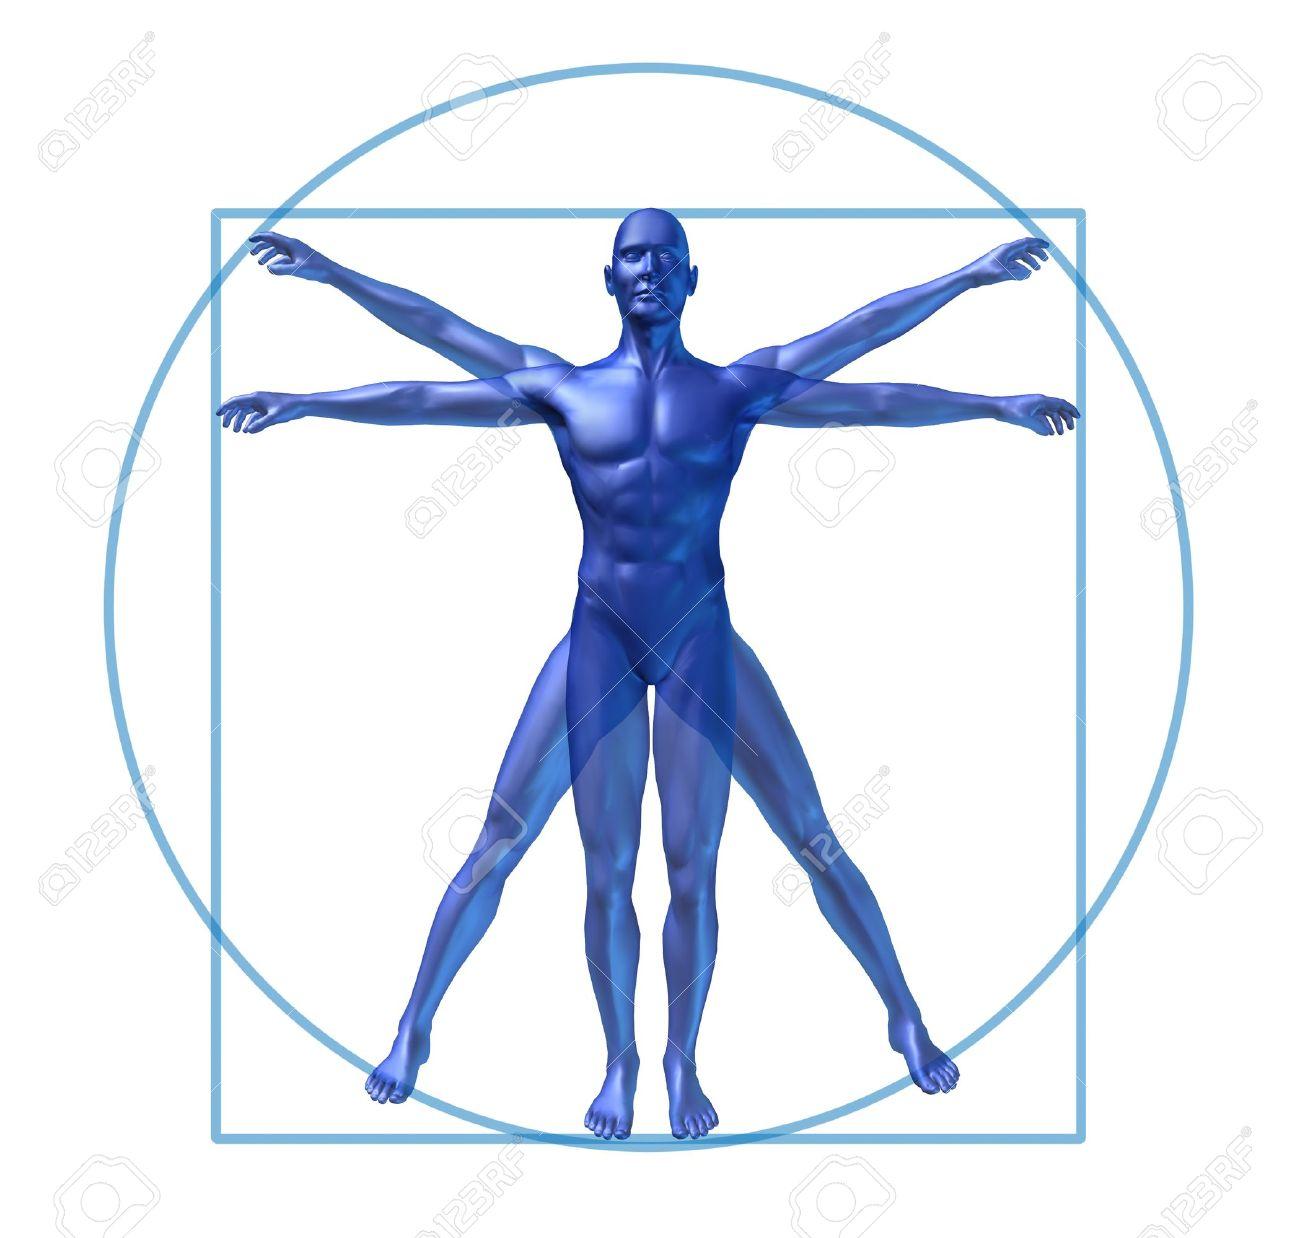 human diagram vitruvian classic man stock photo picture and  : human diagram - findchart.co